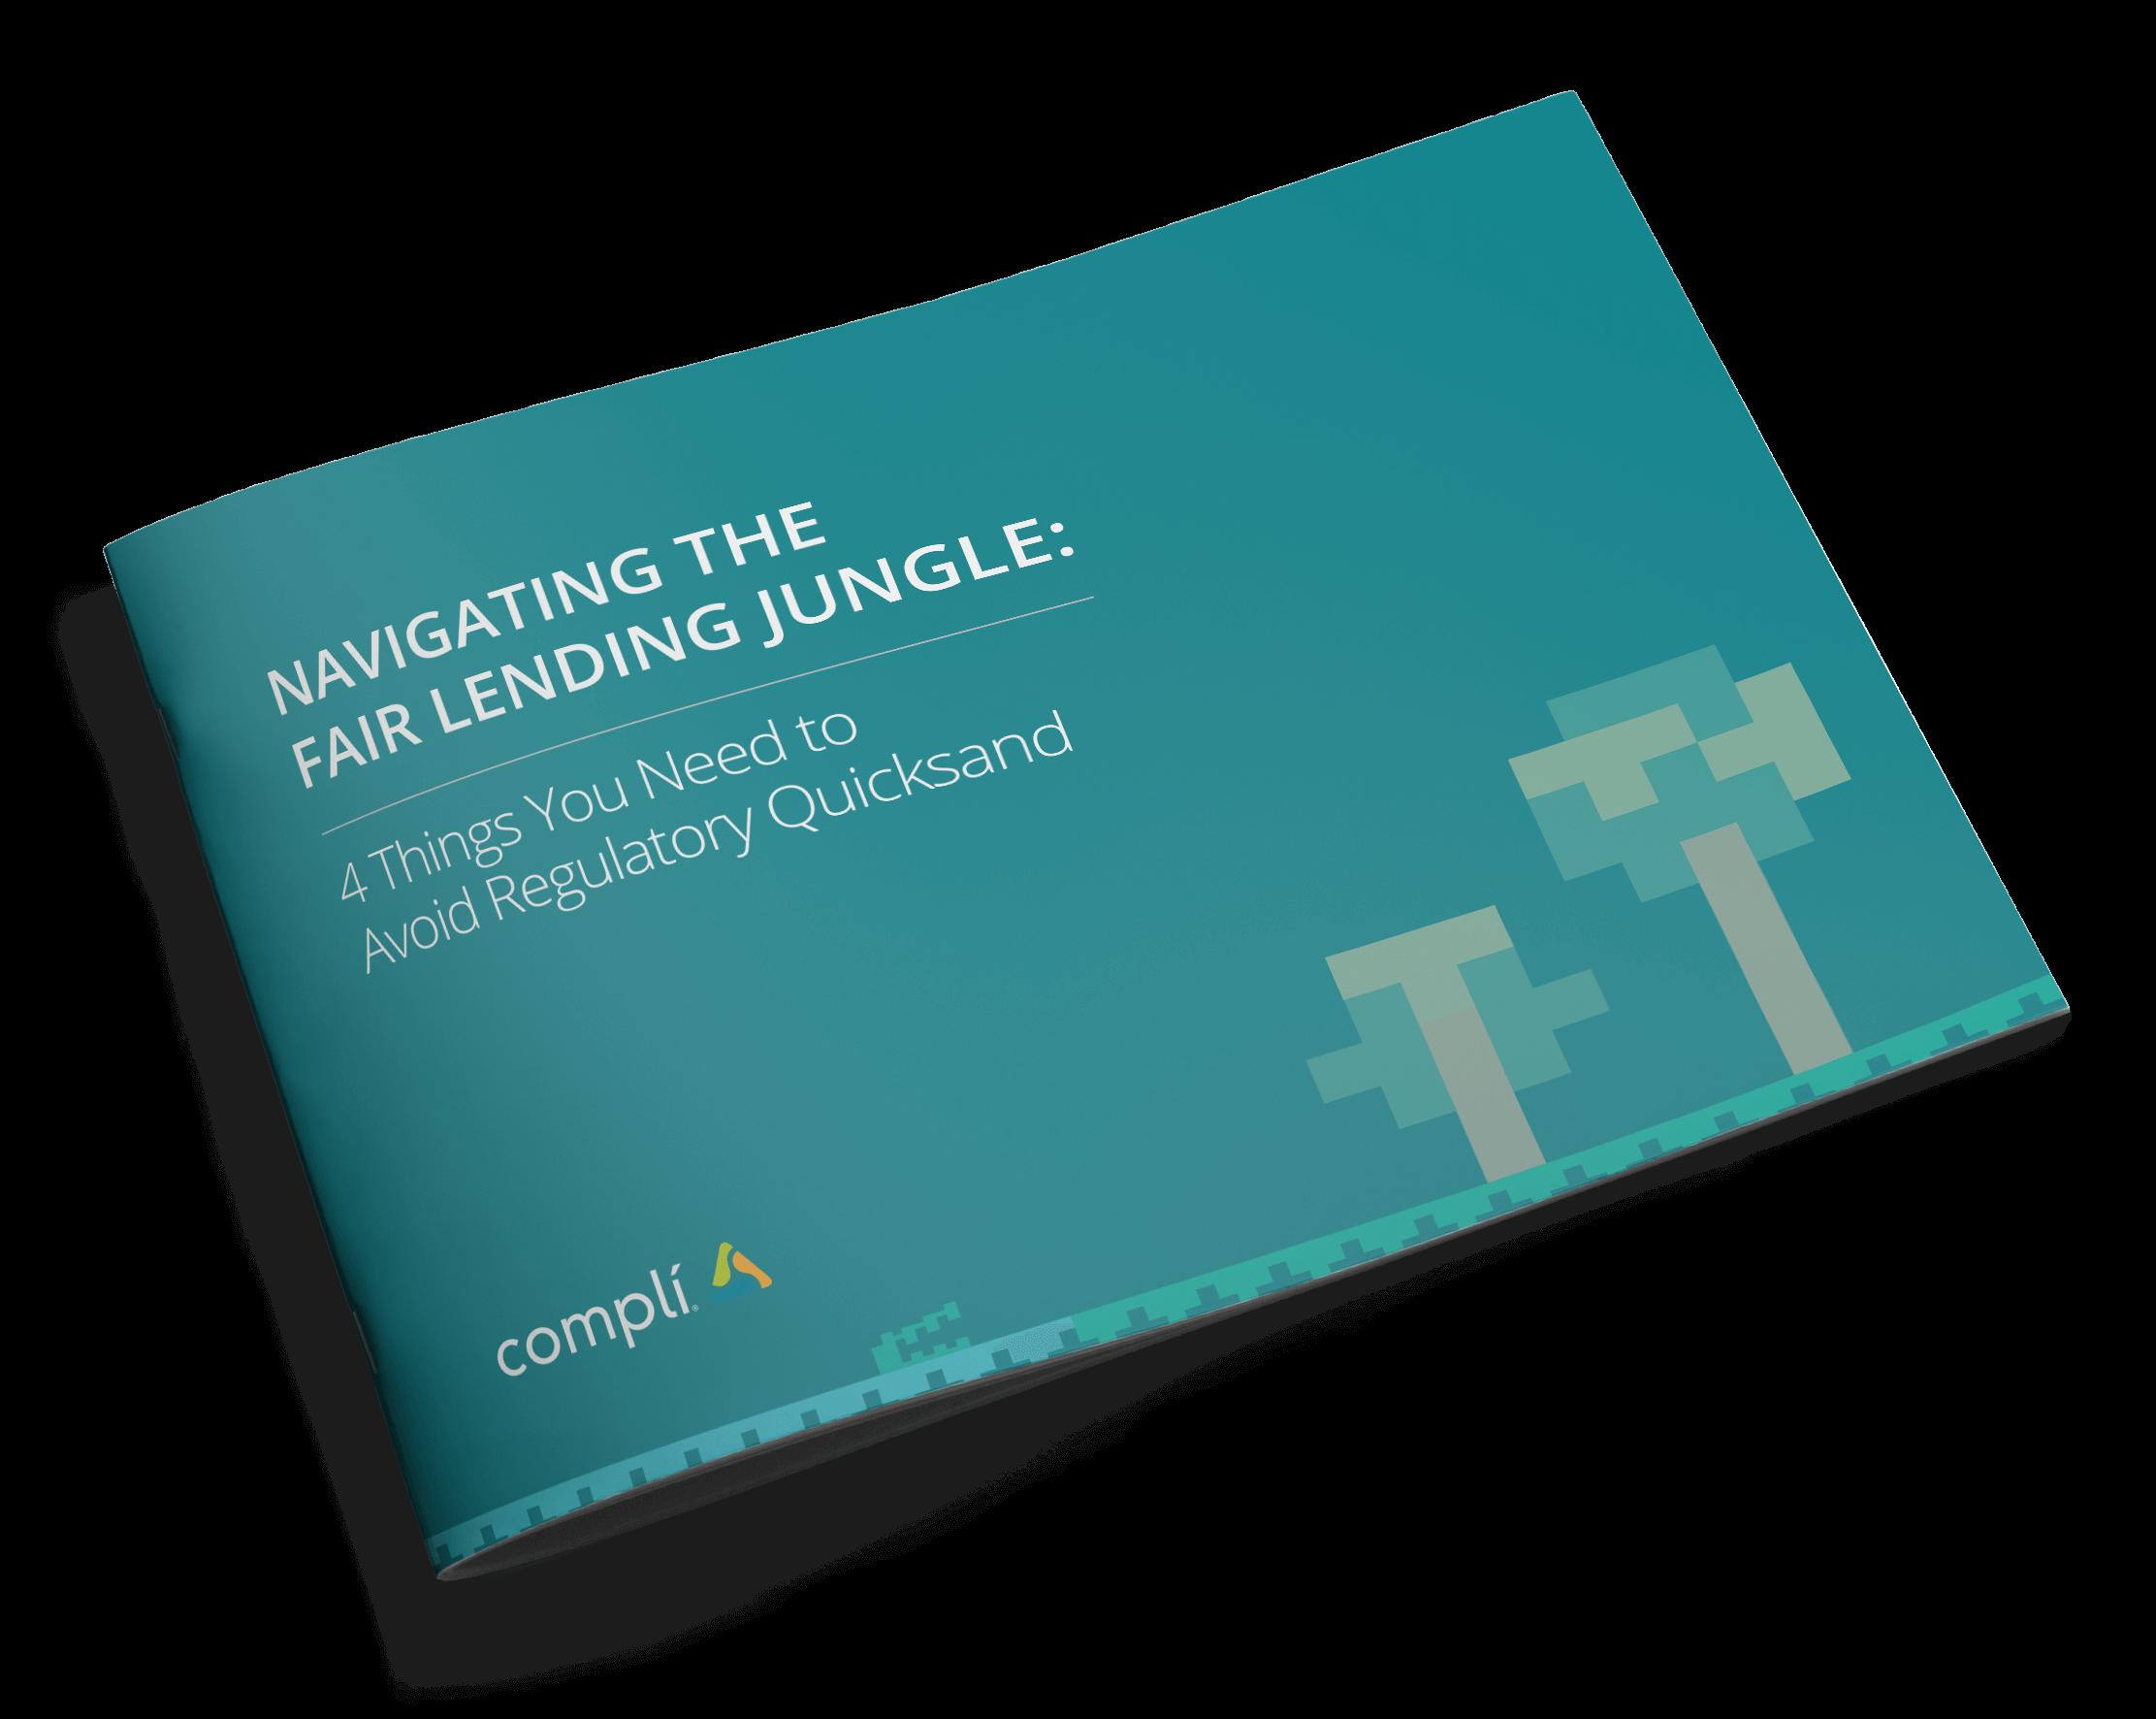 fair lending ebook cover transparent.png